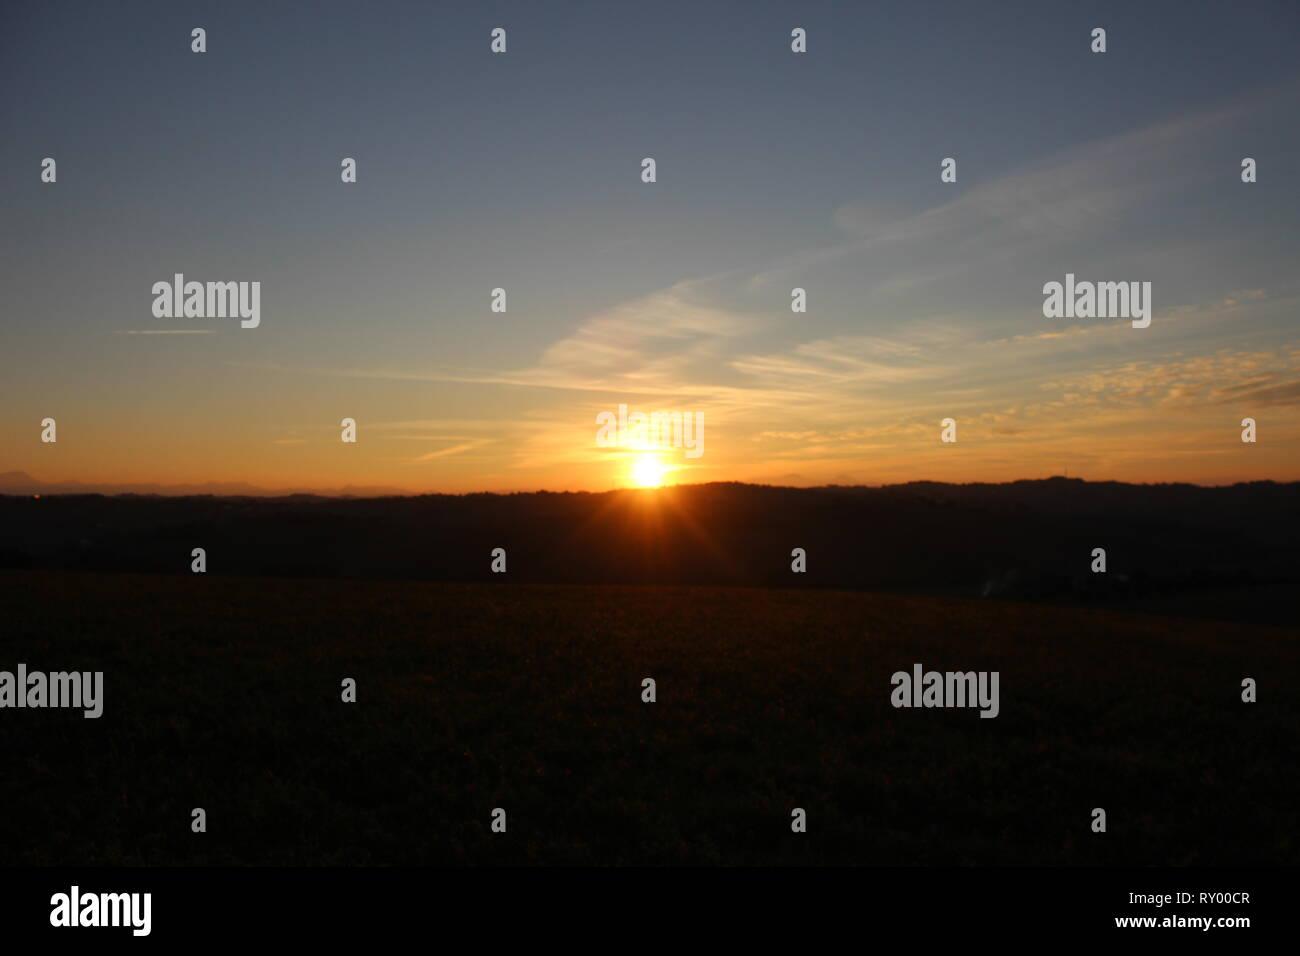 Tramonto - Stock Image